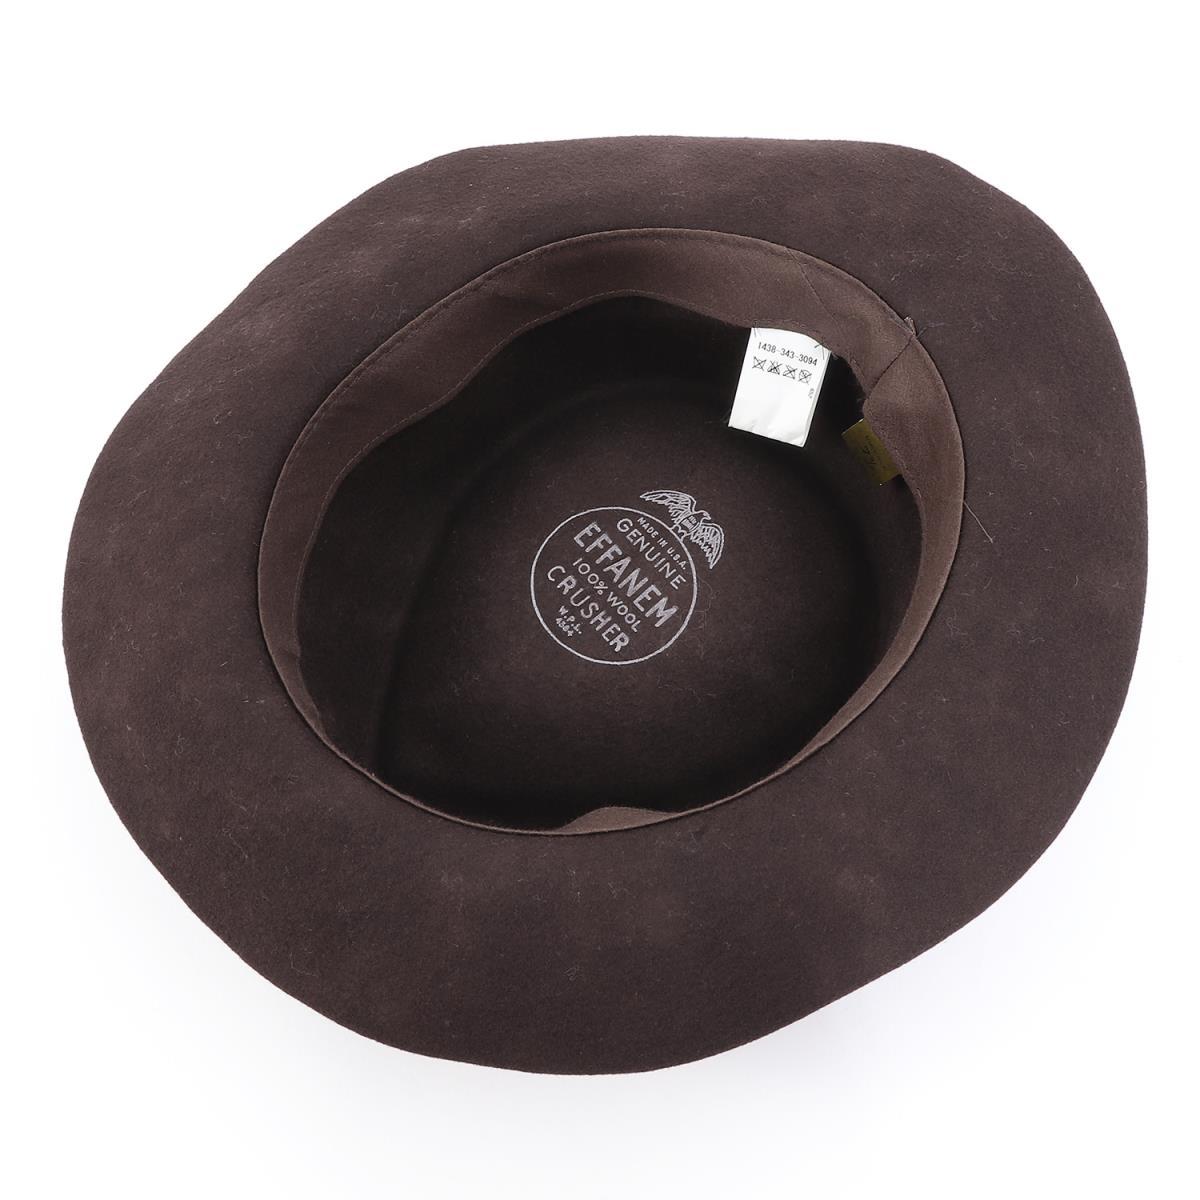 2bbbefe9d EFFANEM (エファネム) wool crusher hat (CRUSHER HAT) brown 7 3/8(59cm)